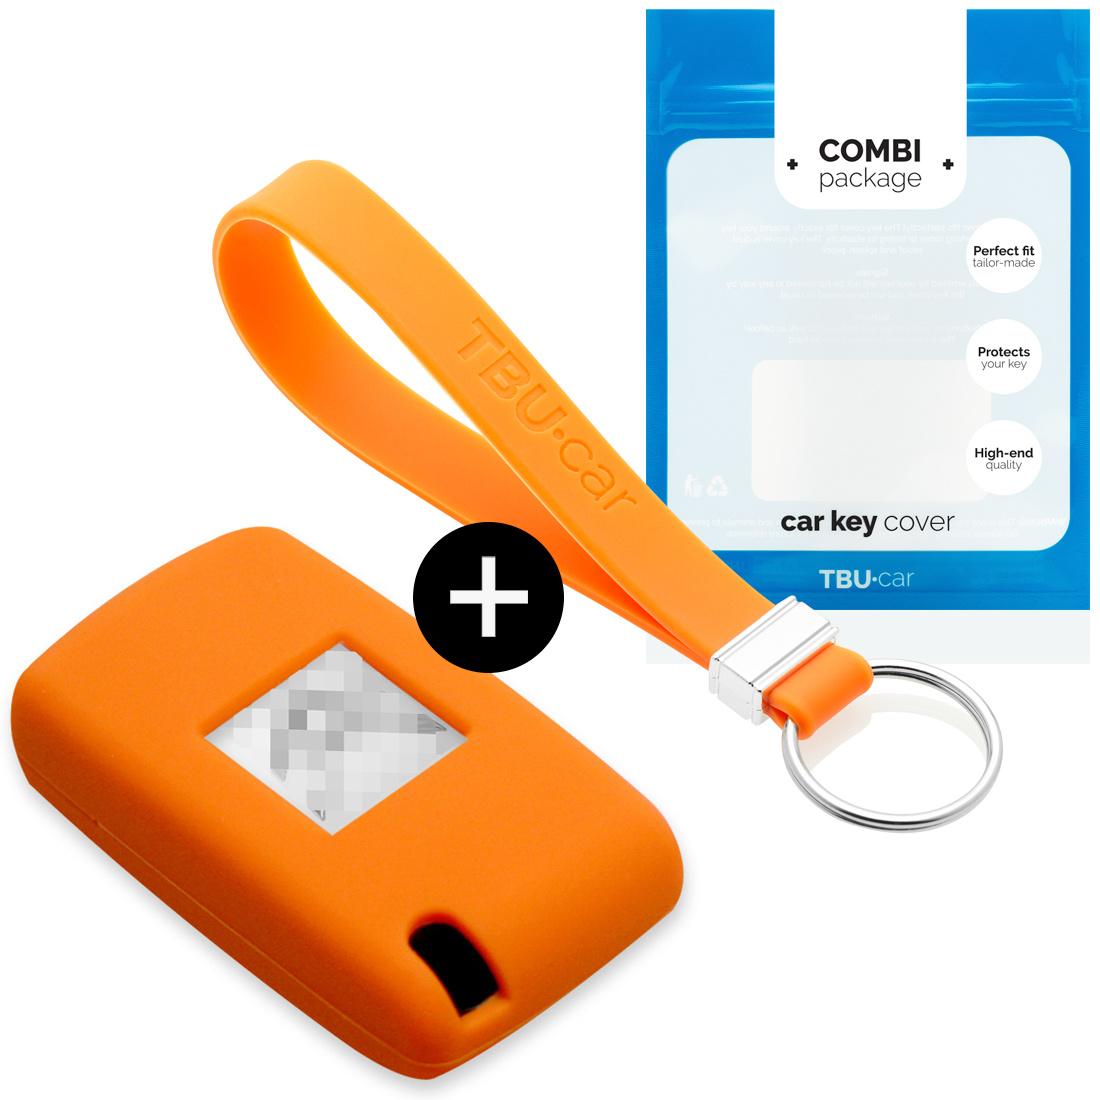 TBU car TBU car Autoschlüssel Hülle kompatibel mit Citroën 3 Tasten - Schutzhülle aus Silikon - Auto Schlüsselhülle Cover in Orange